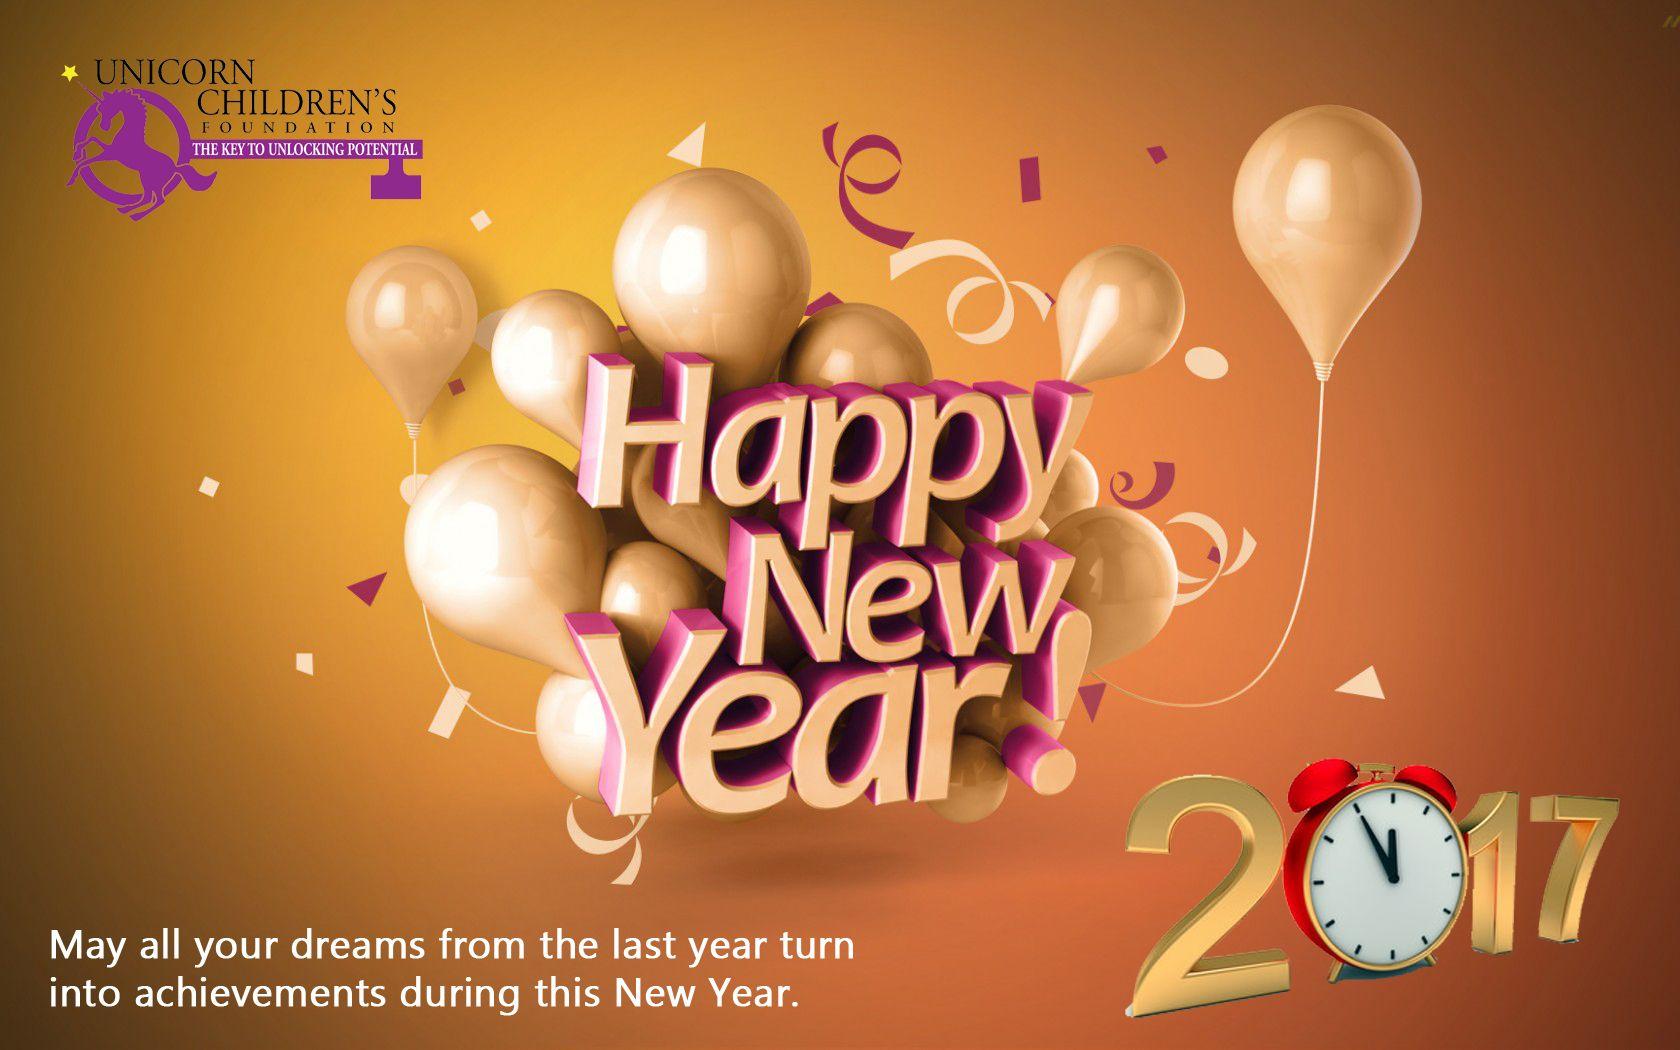 Happy New Year From Unicorn Childrens Foundation Unicorn